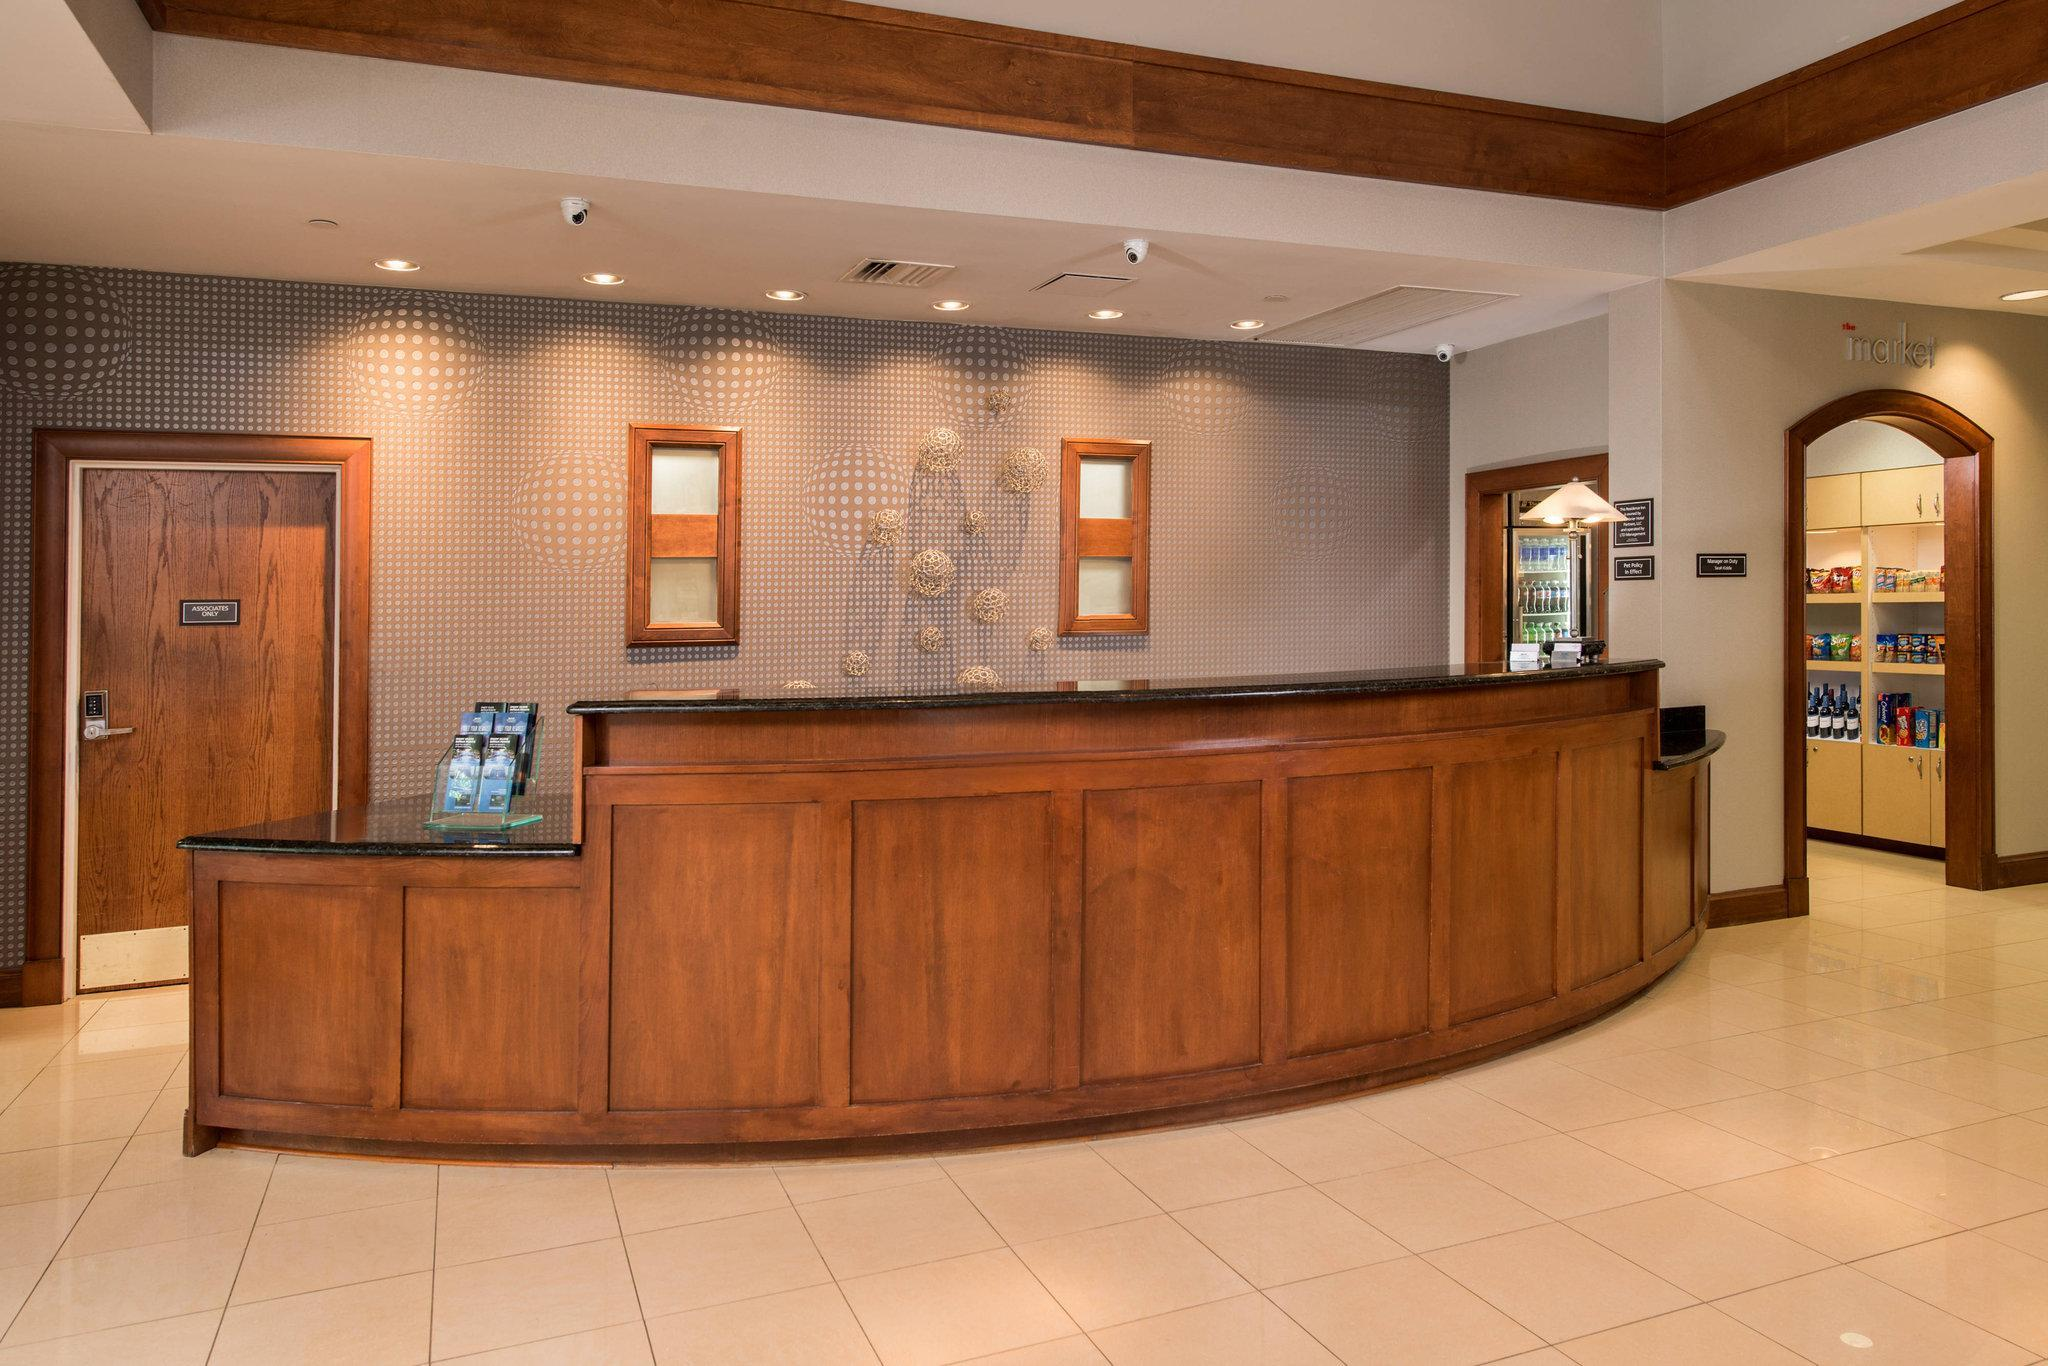 Residence inn chesapeake greenbrier in chesapeake va - 2 bedroom suites in chesapeake va ...